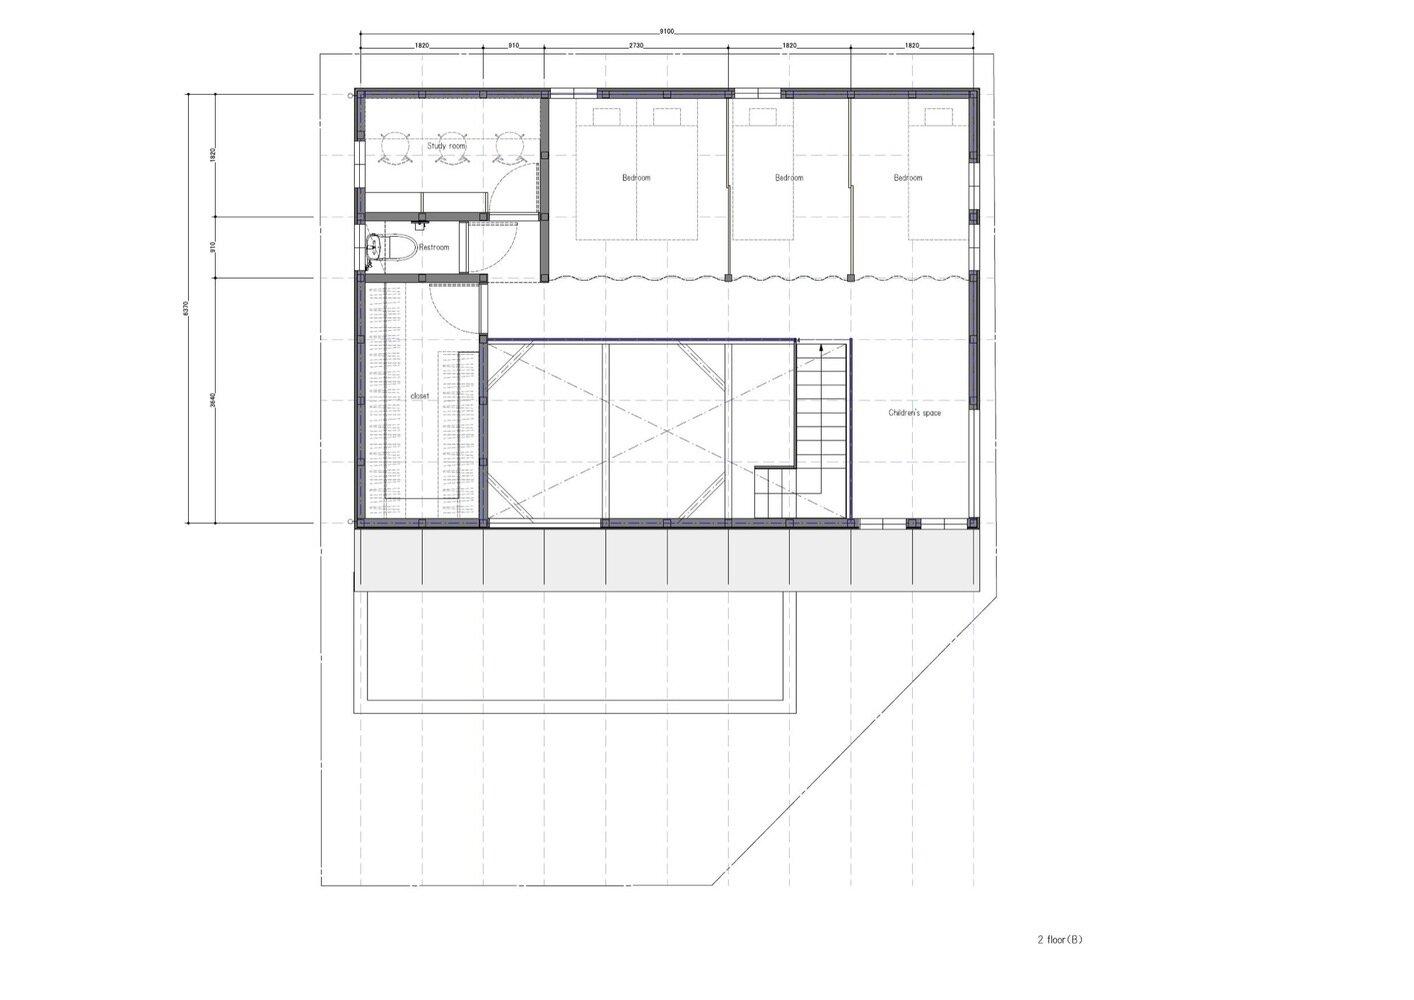 S-House - Coil Kazuteru Matumura Architects - Japan - Floor Plan 2 - Humble Homes